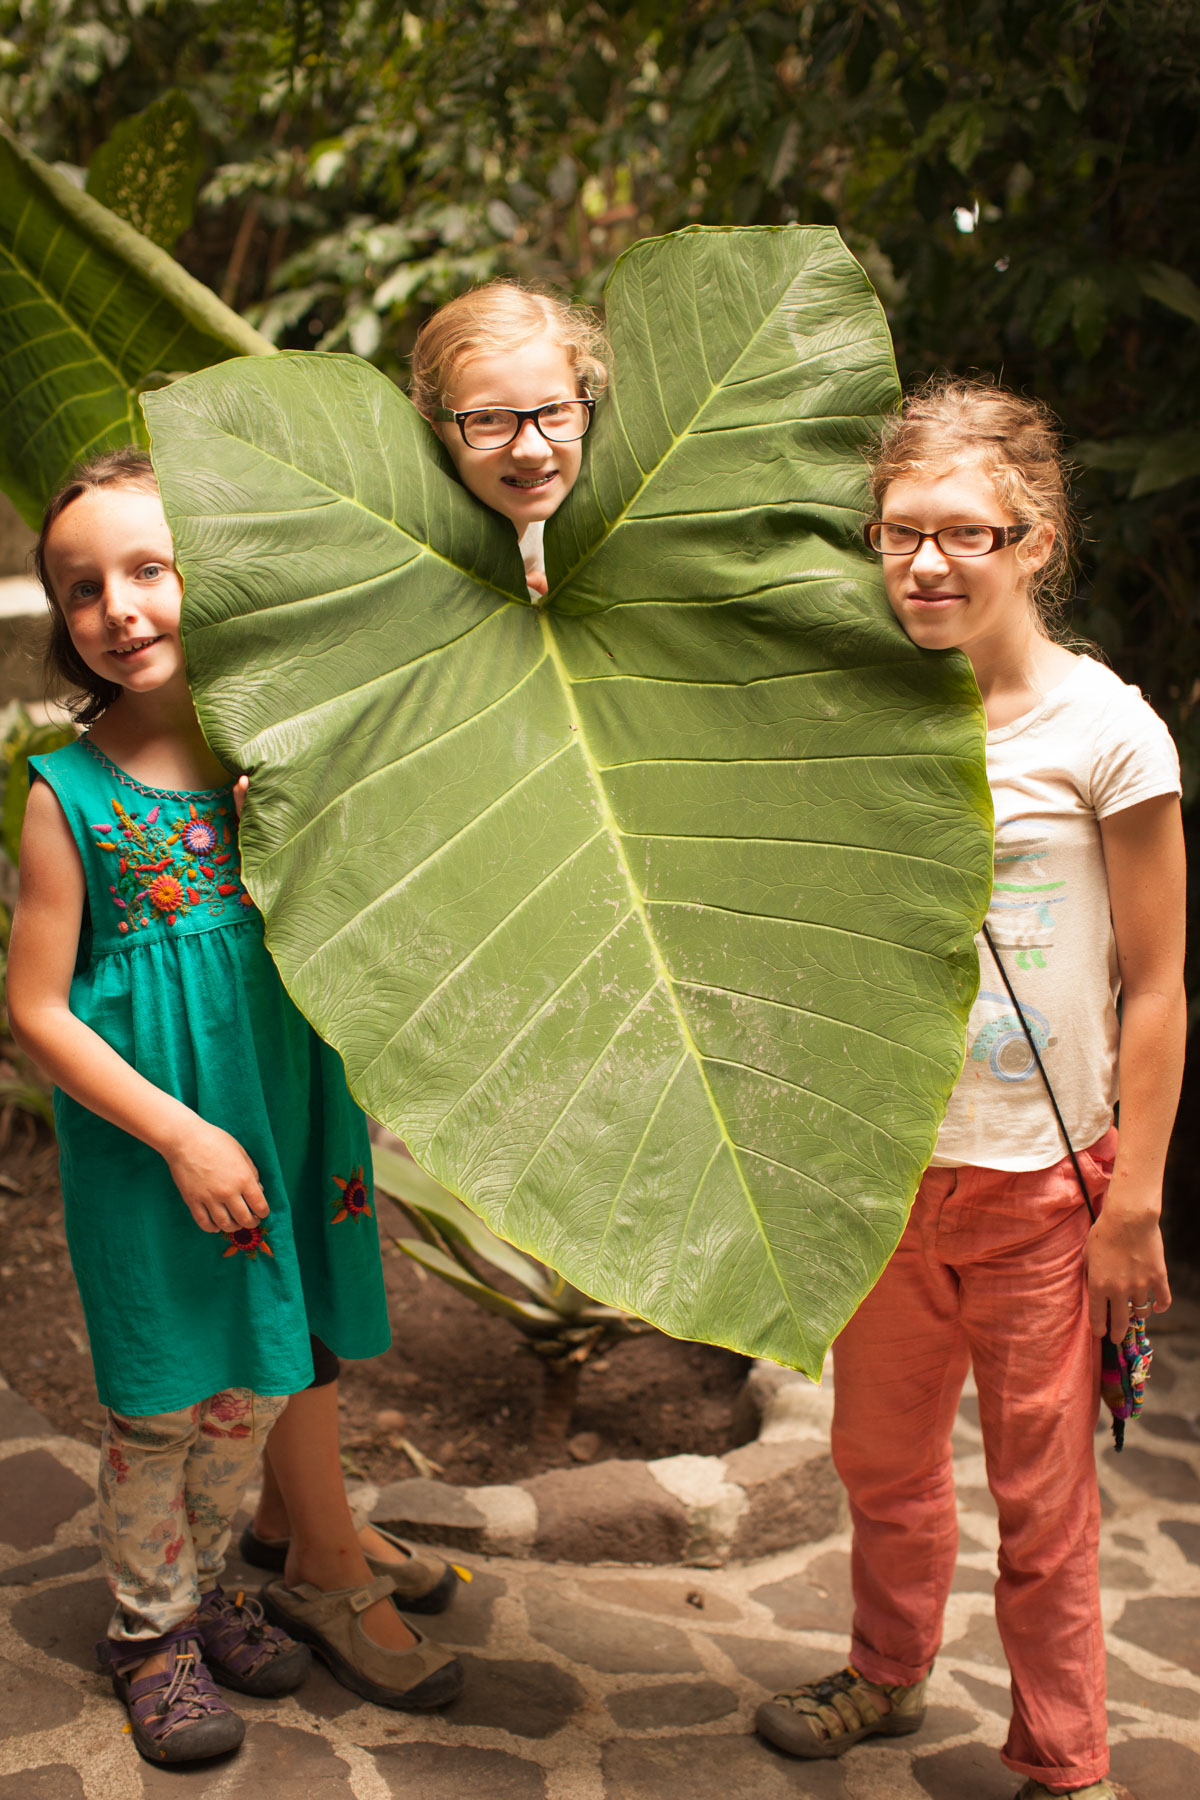 Large banana leaf - Jaibalito, Guatemala - Vezzani Photography